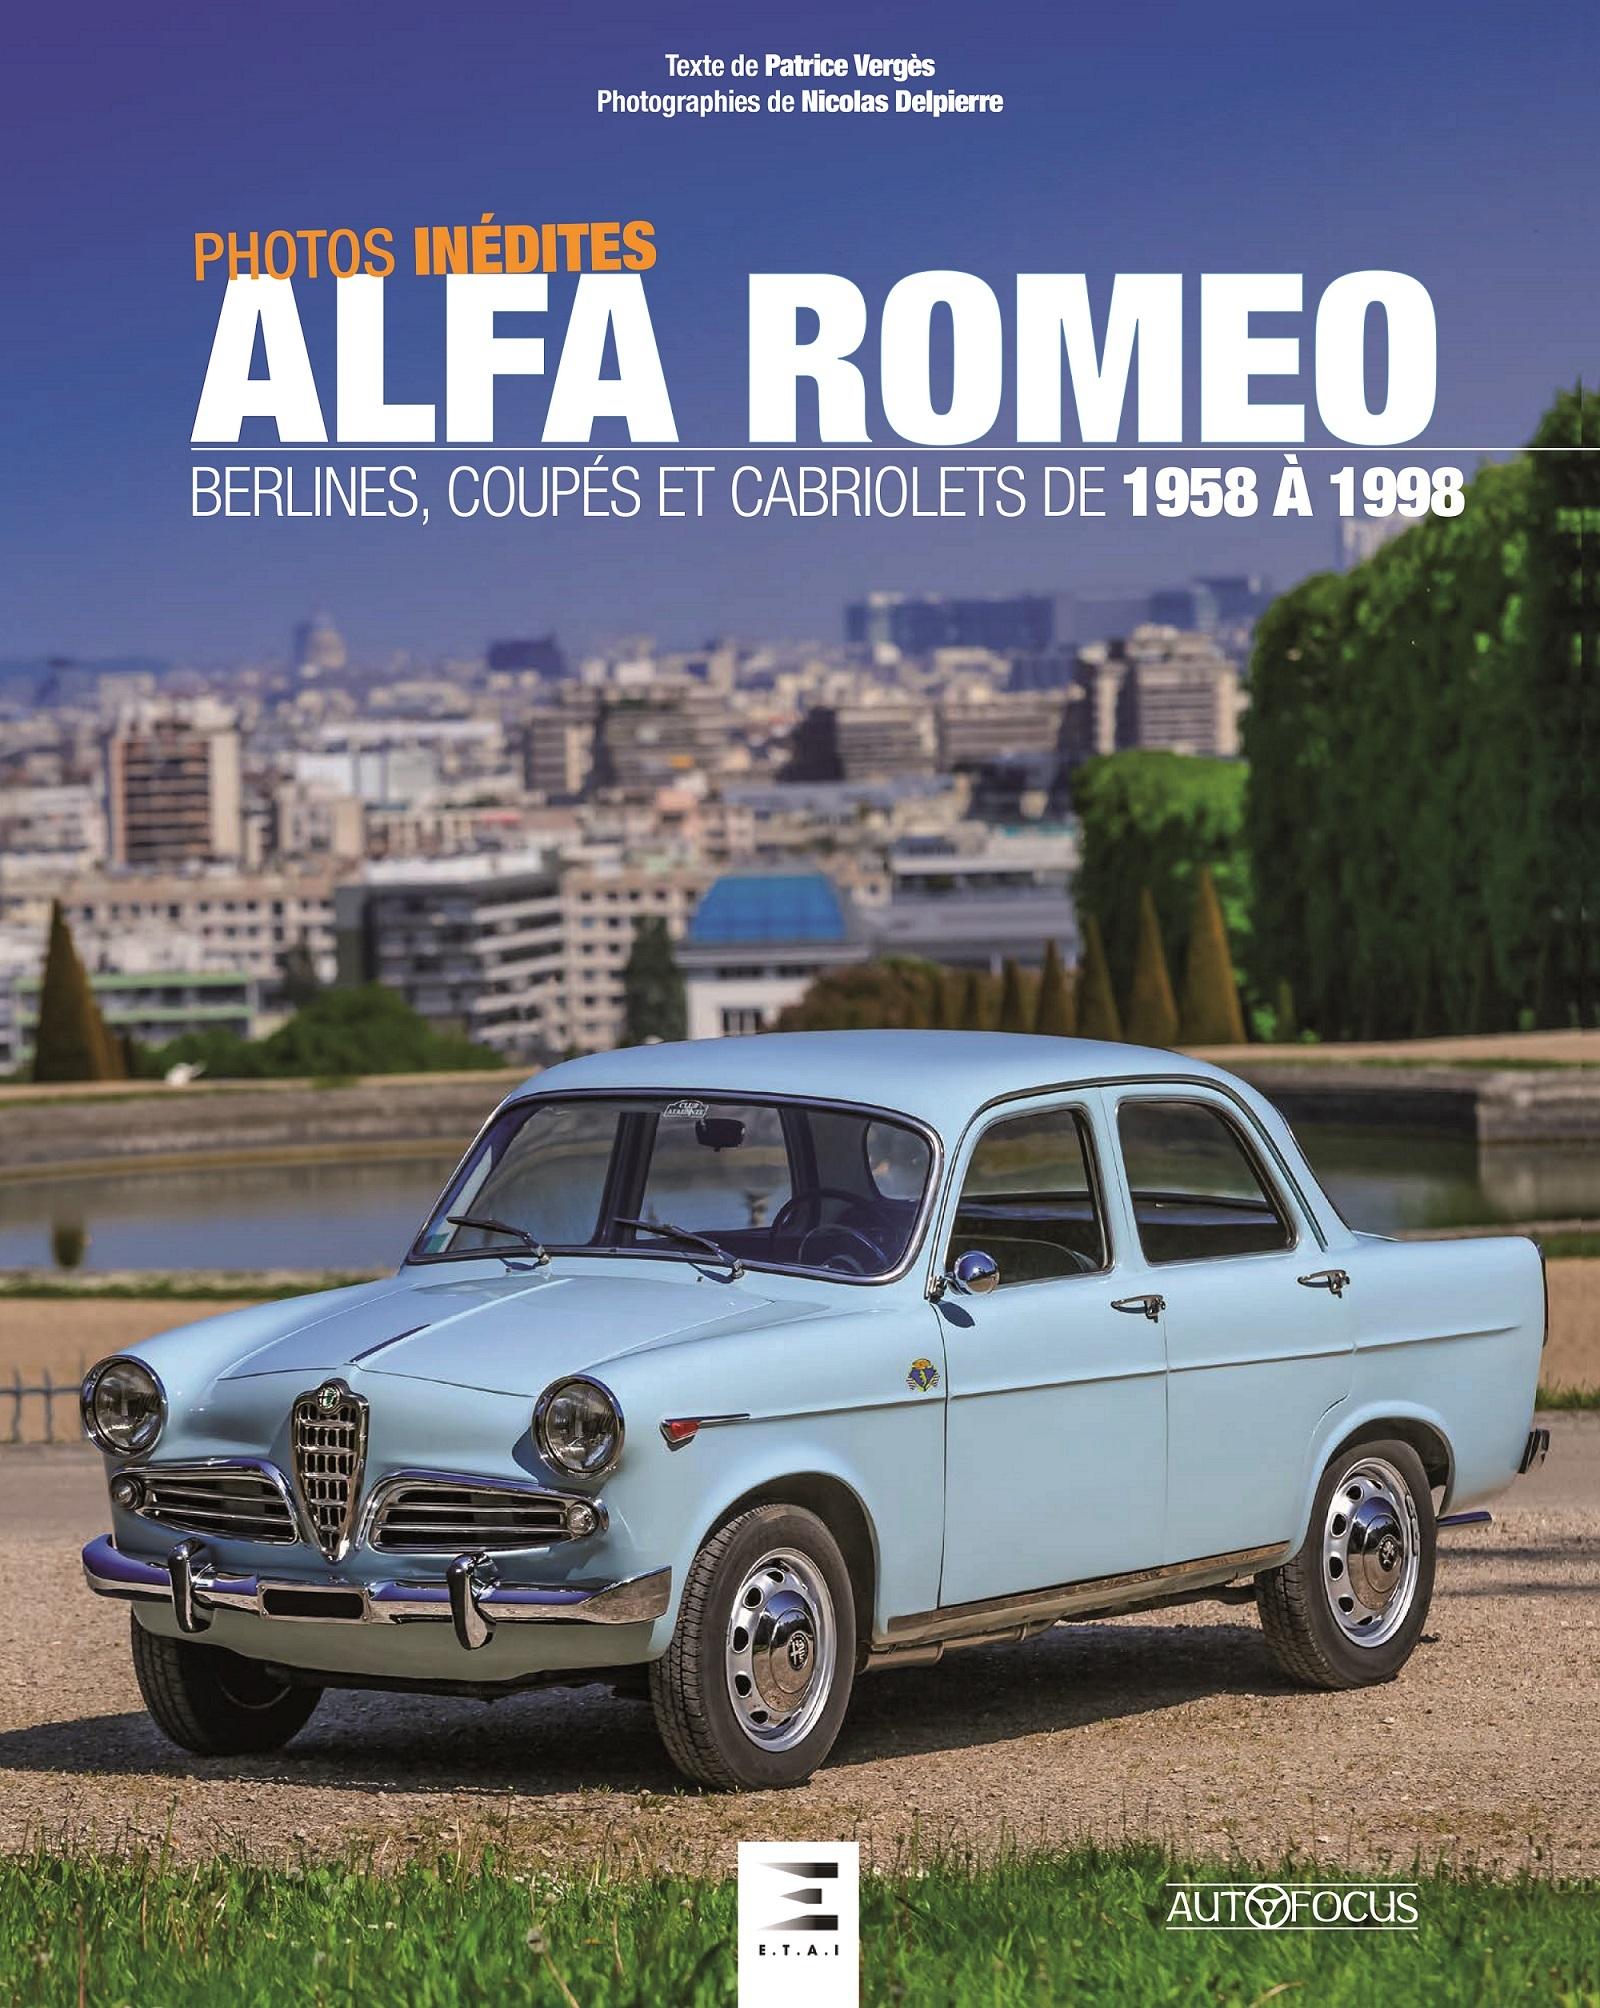 ALFA ROMEO, BERLINES, COUPES ET CABRIOLETS